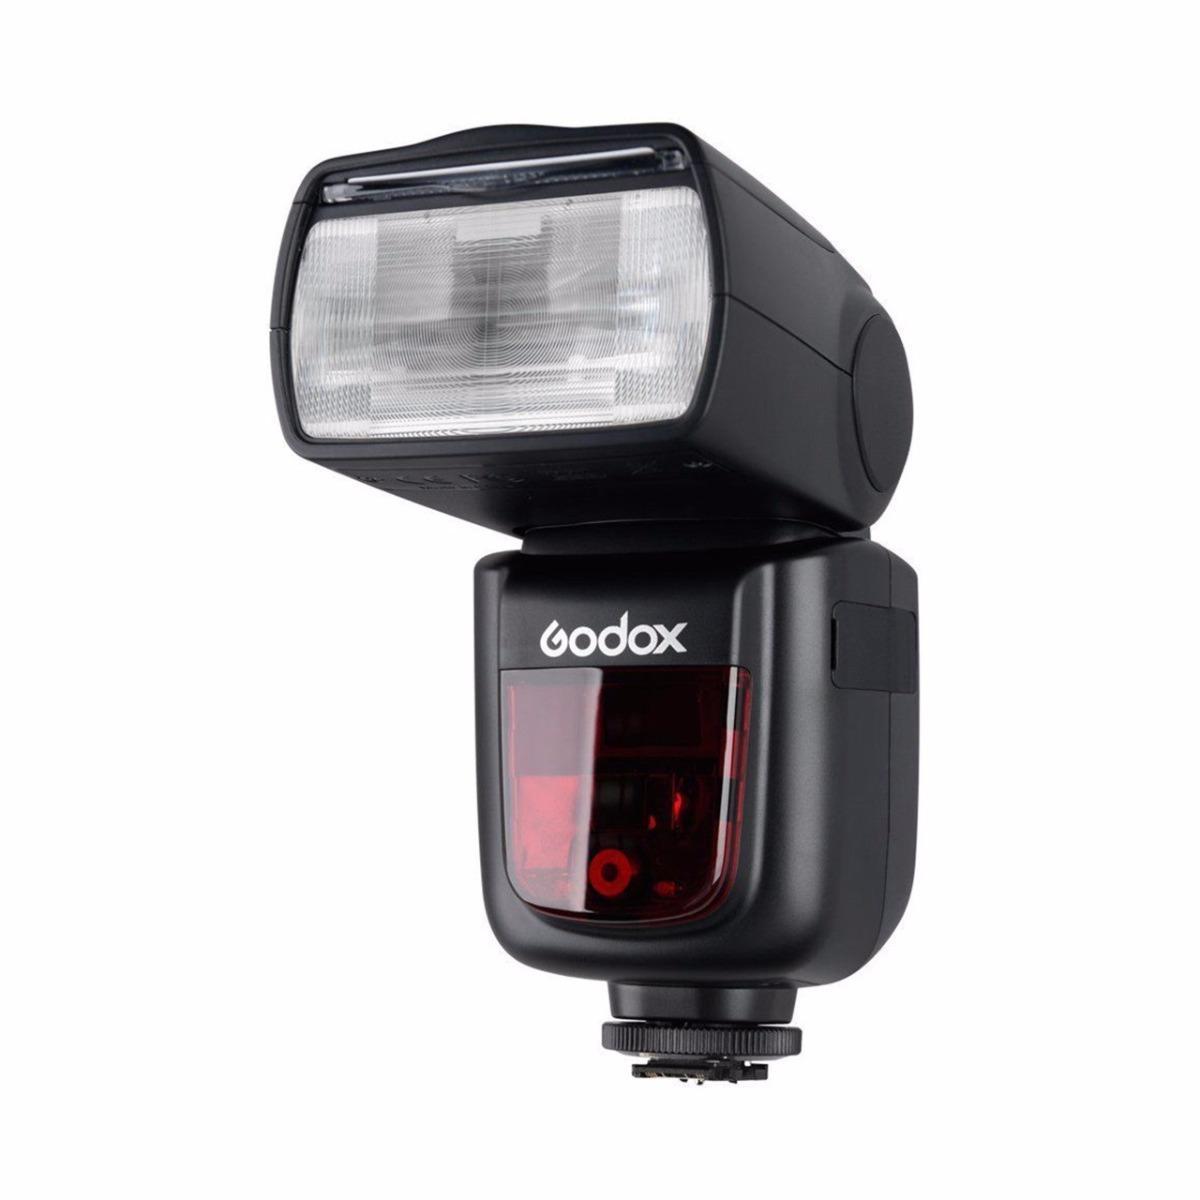 Godox Ving V860 II TTL Li-Ion Flash Kit for Canon Cameras (Black)